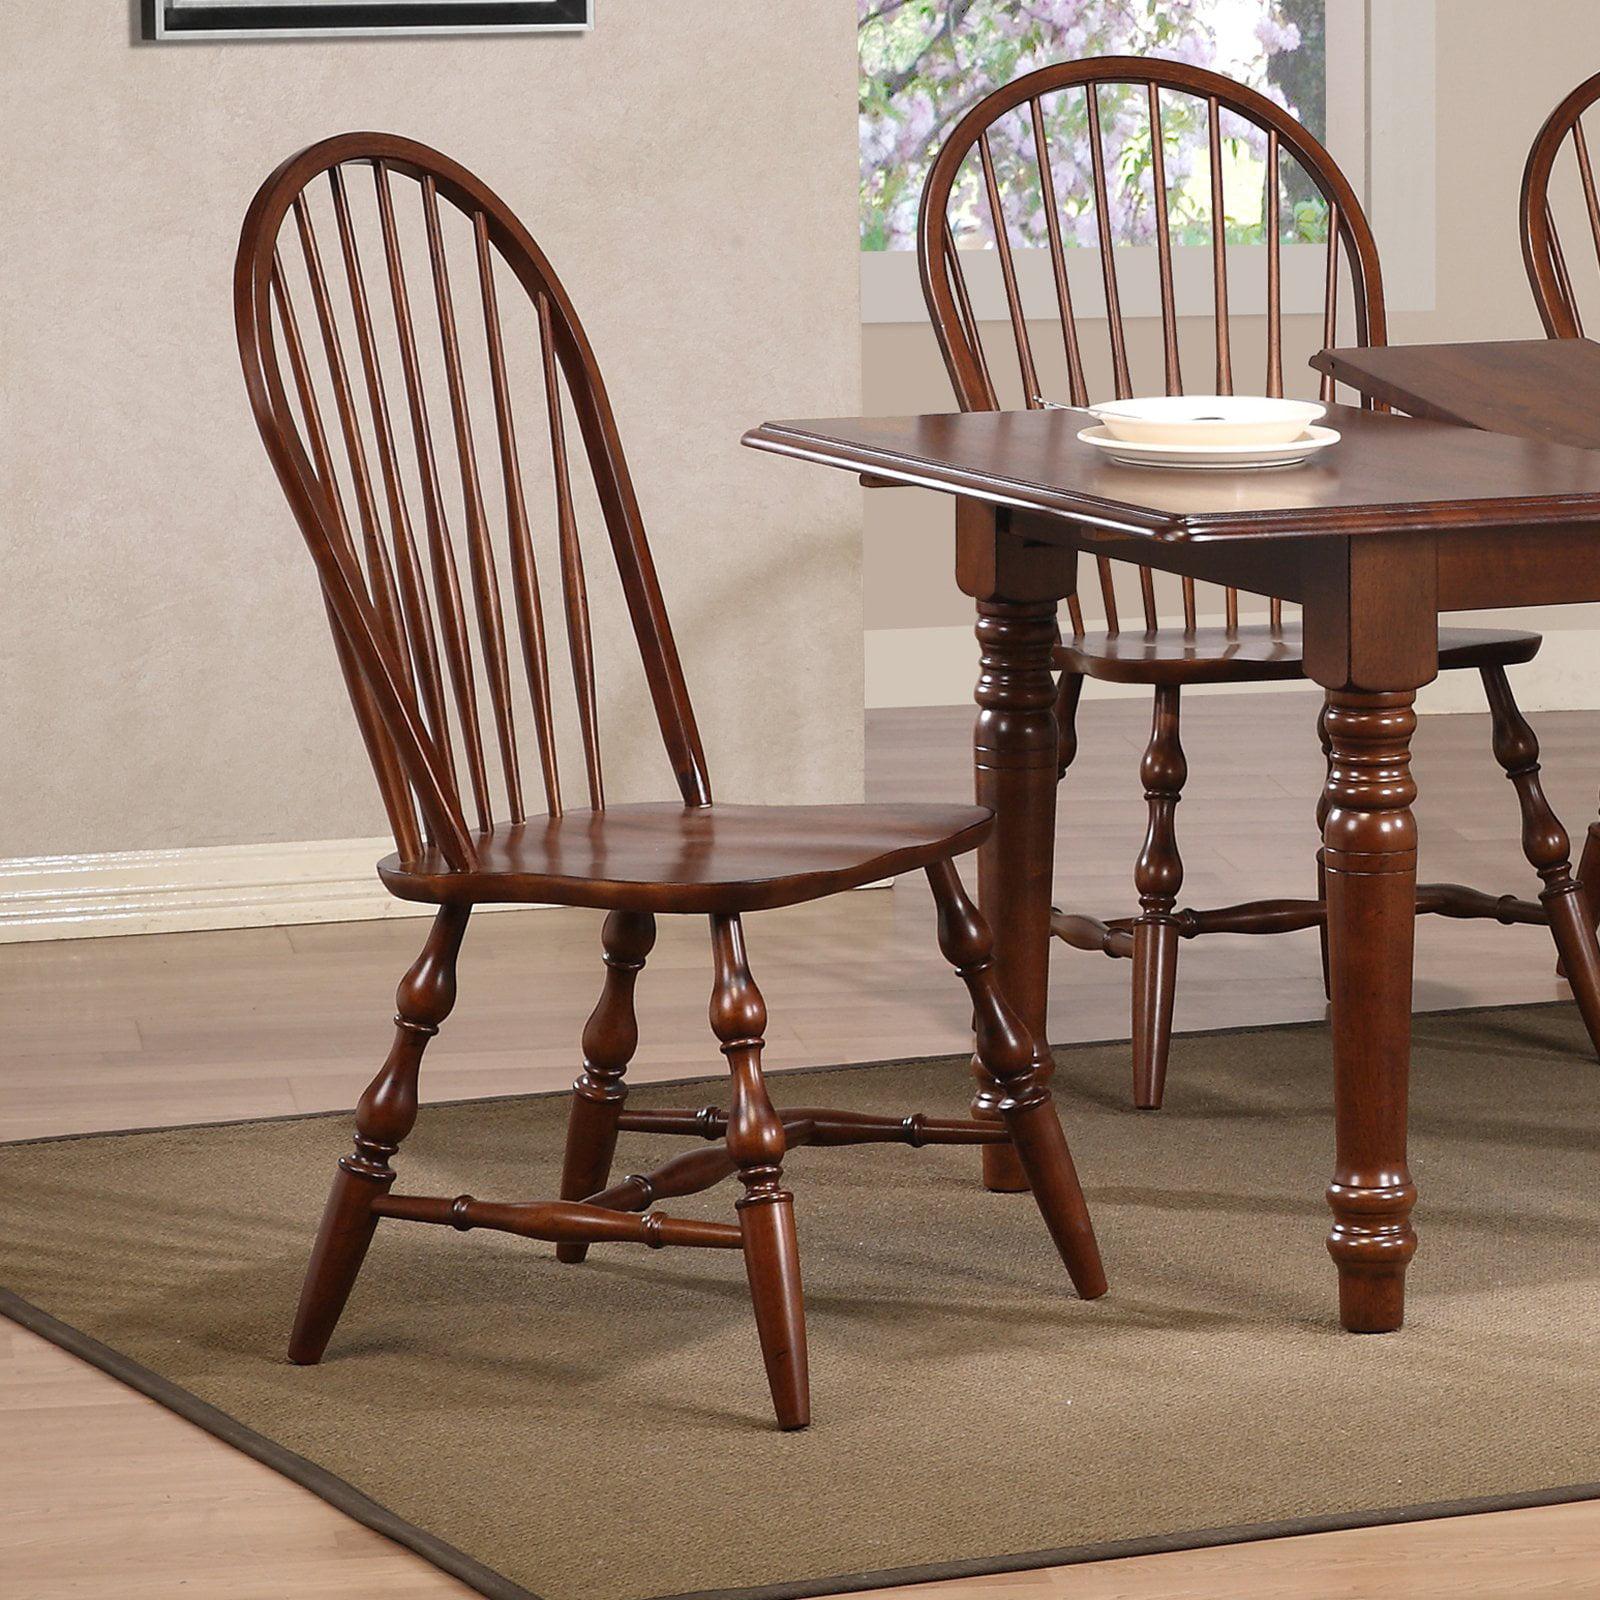 Sunset Trading Windsor Spindleback Dining Chair - Chestnut ...